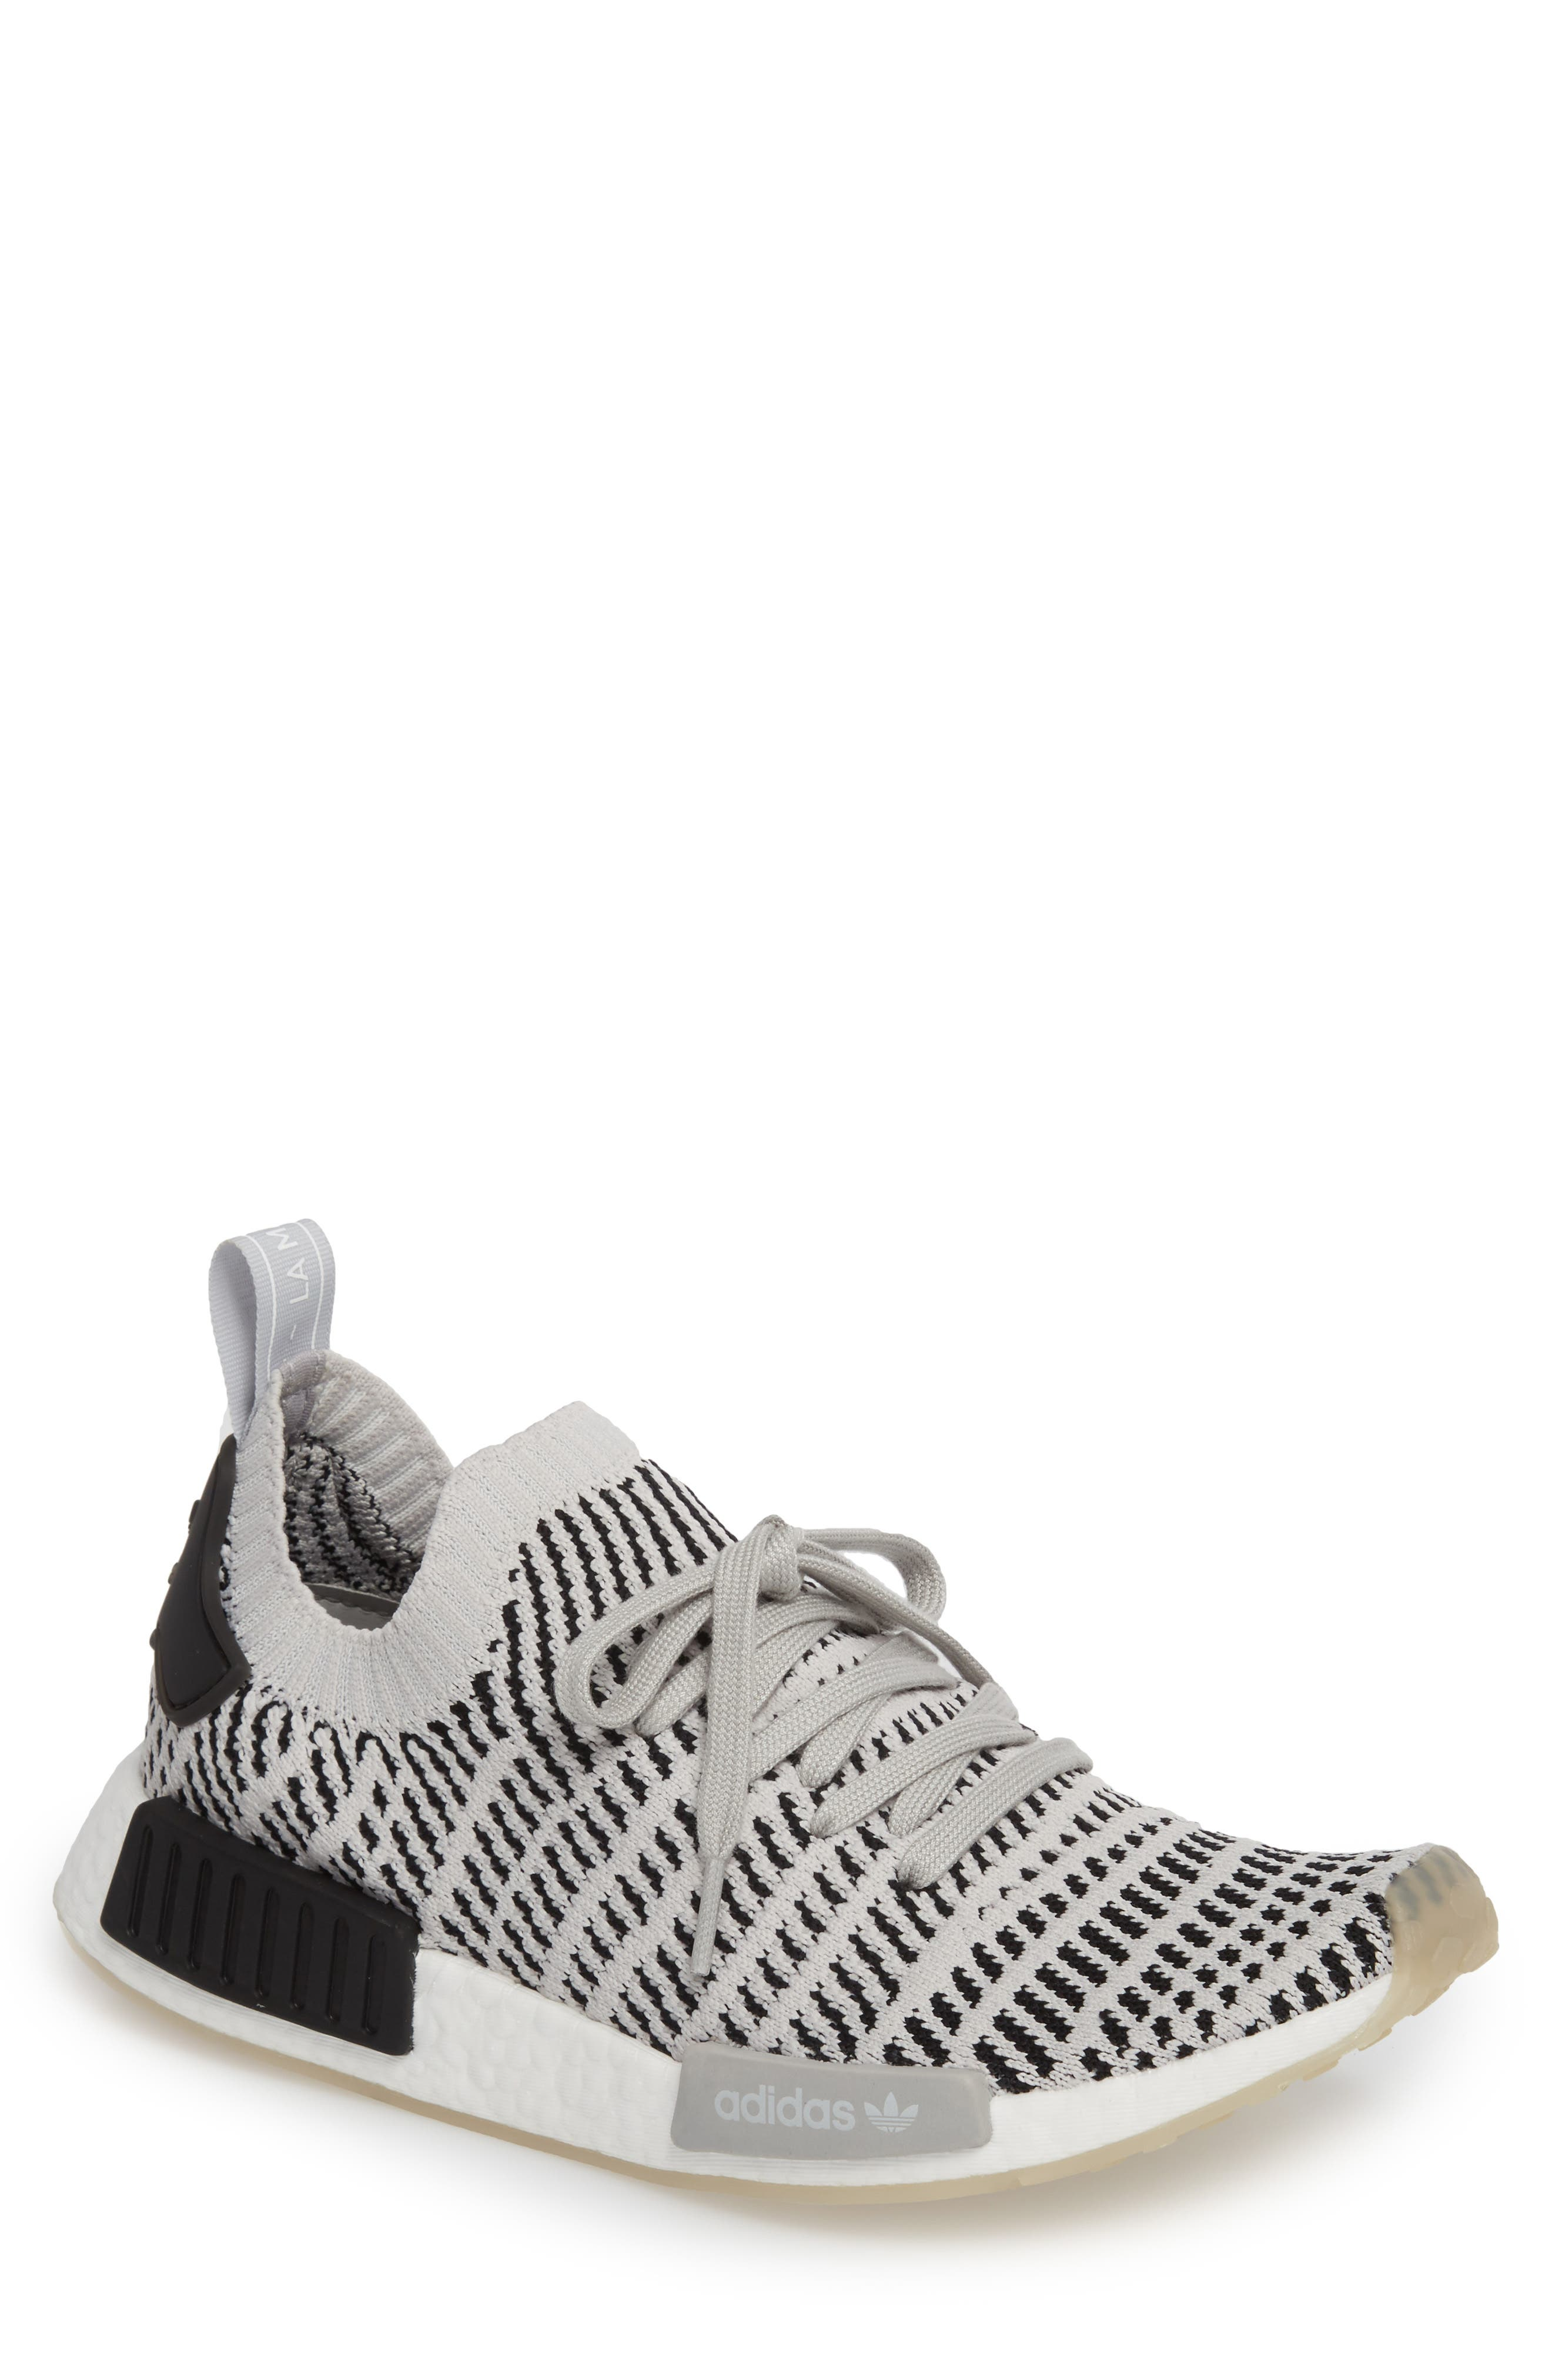 adidas NMD R1 STLT Primeknit Sneaker (Men)